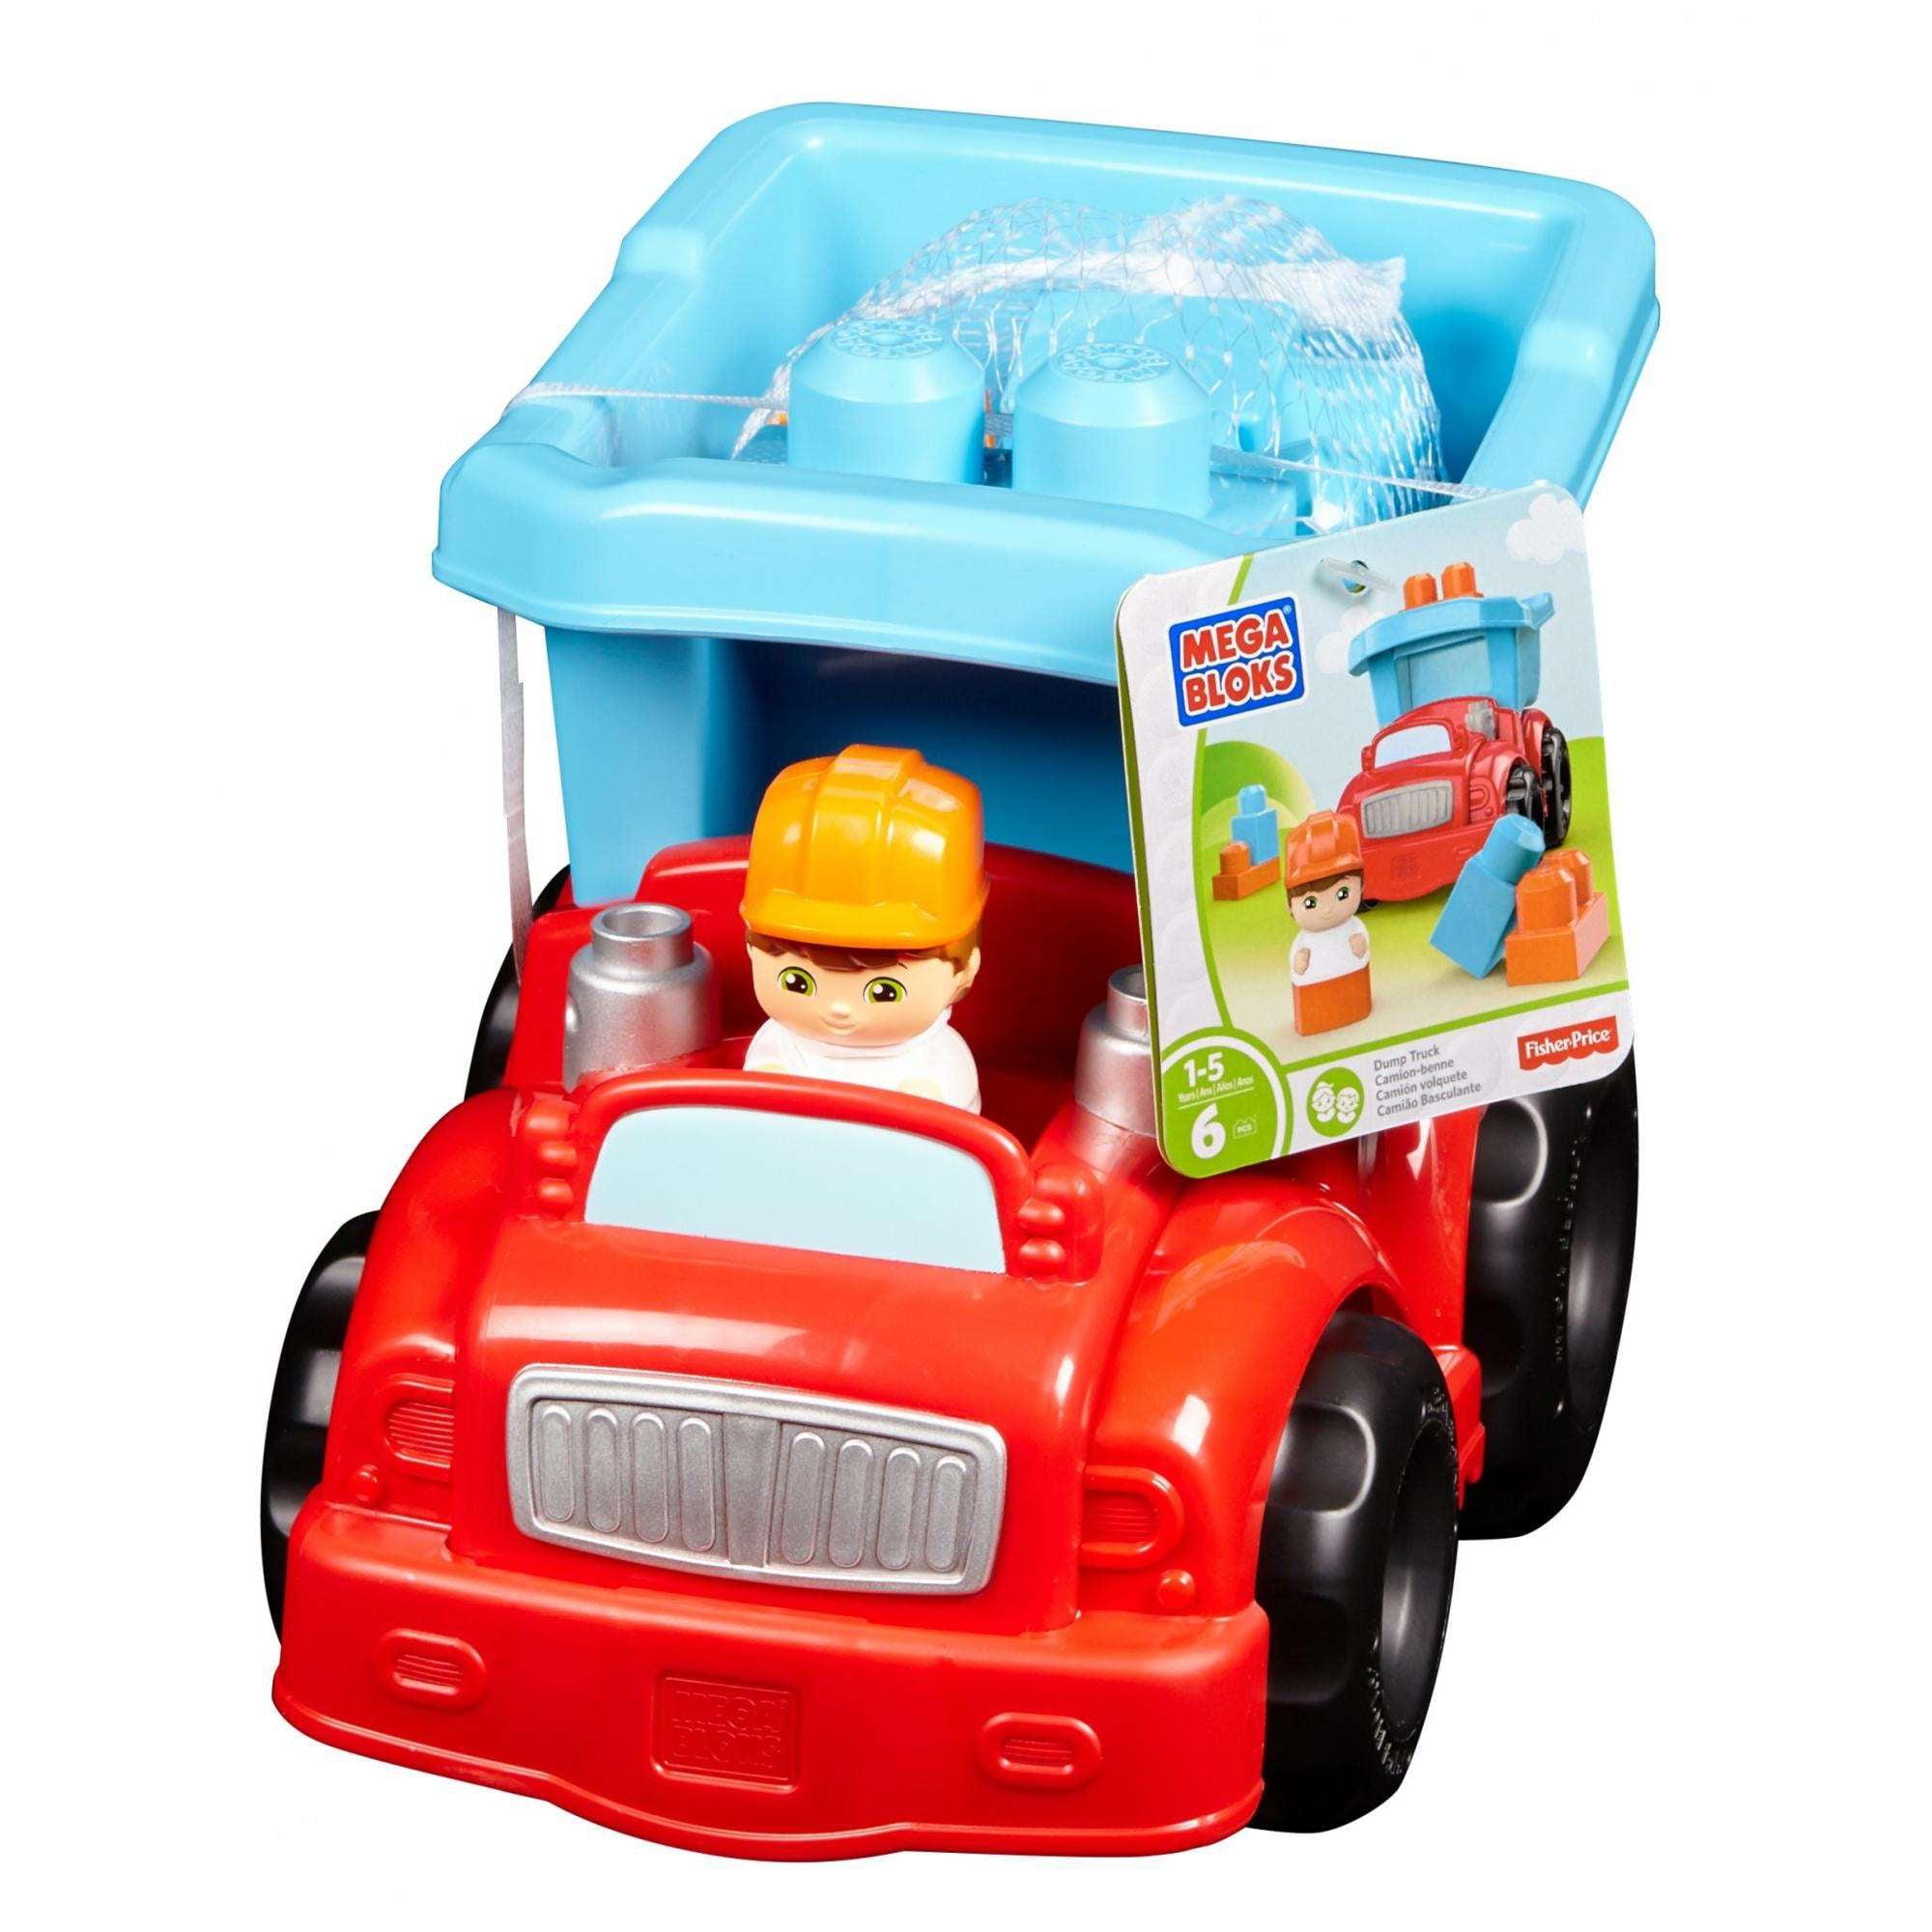 Mega Bloks Dump Truck by Mega Bloks